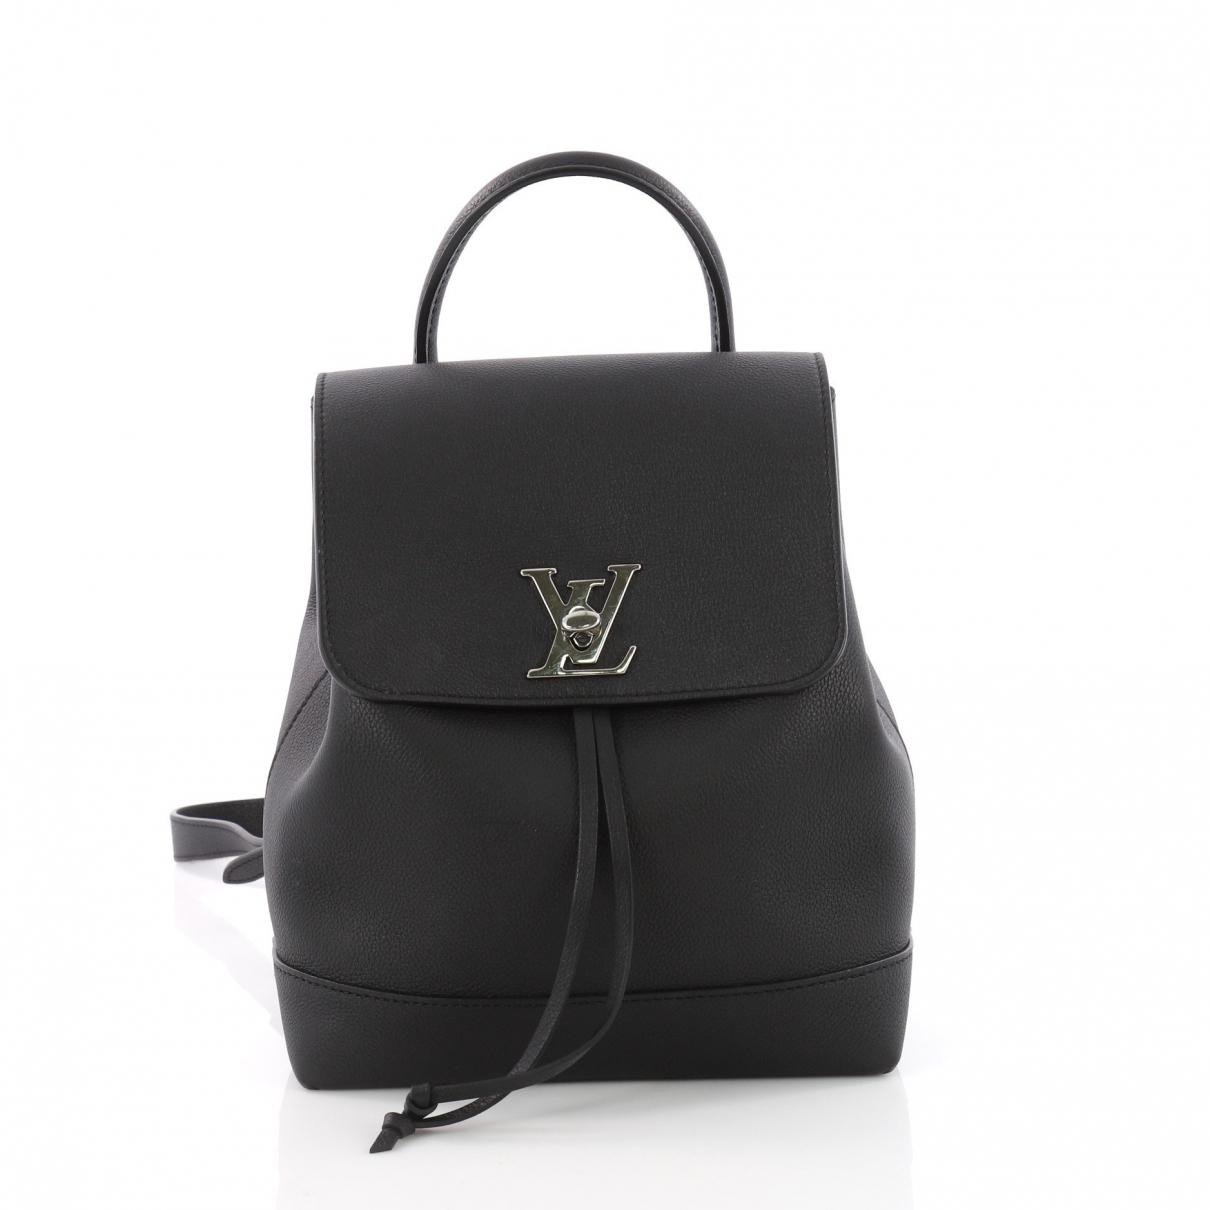 Louis Vuitton Pre-owned Cloth Handbag in Black - Lyst 30106701c0779